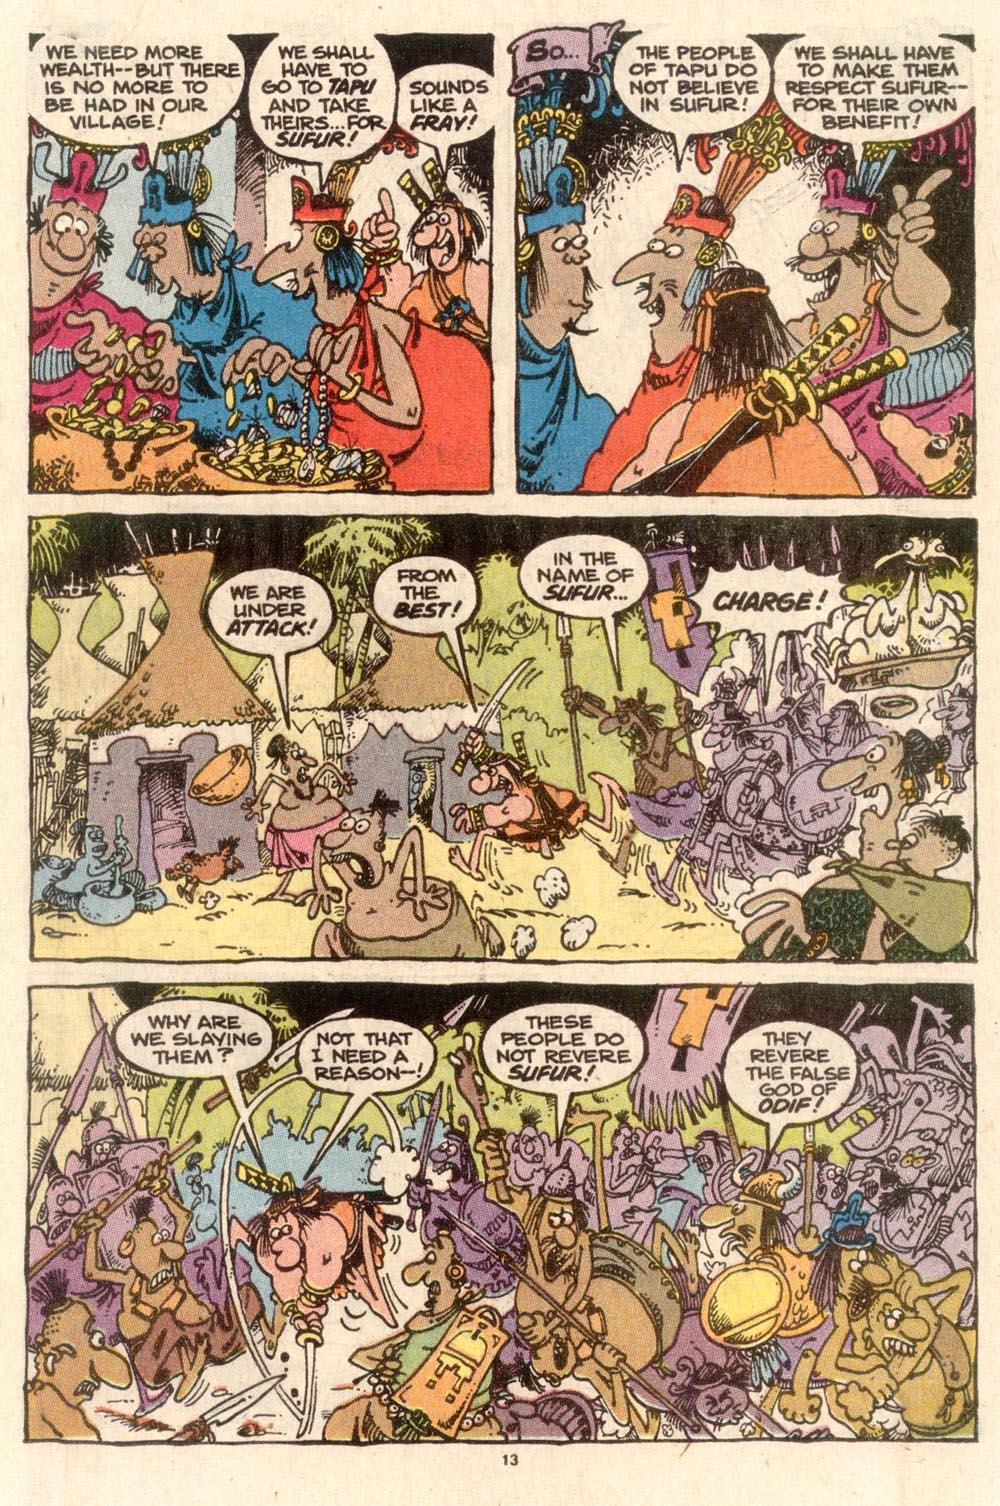 Read online Sergio Aragonés Groo the Wanderer comic -  Issue #58 - 13